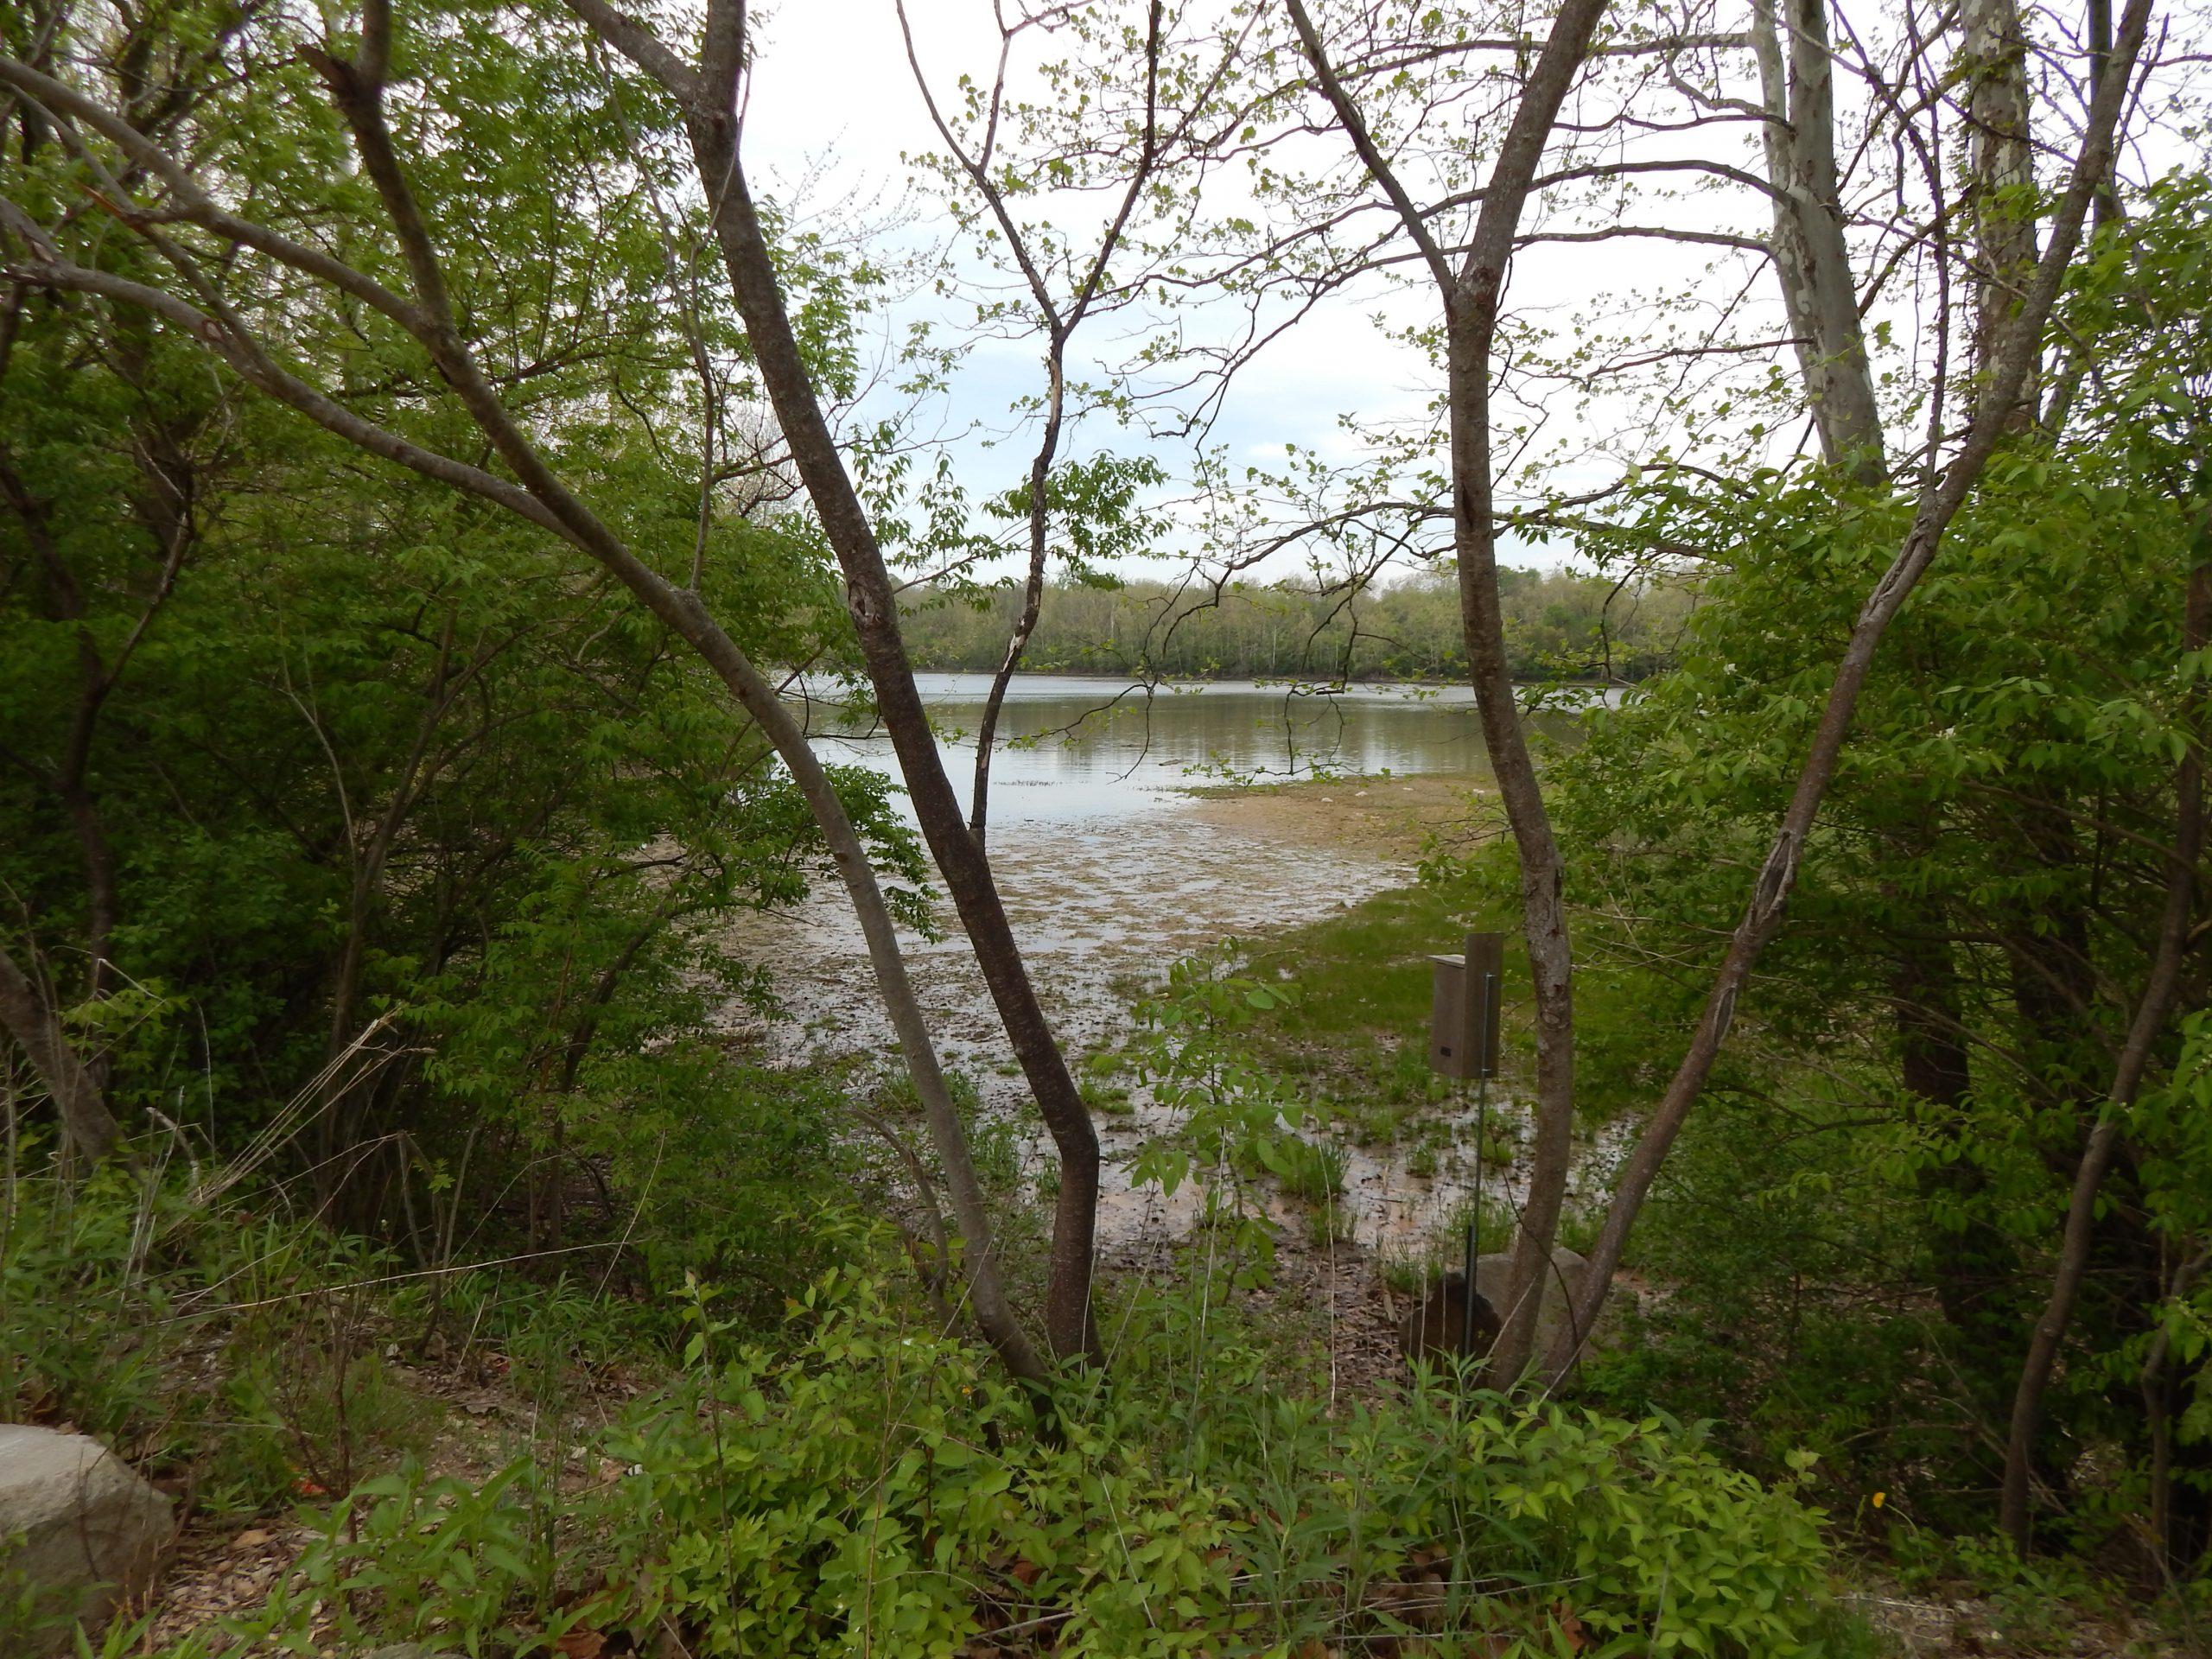 Virginia B. Fairbanks Art and Nature Park: 100 Acres